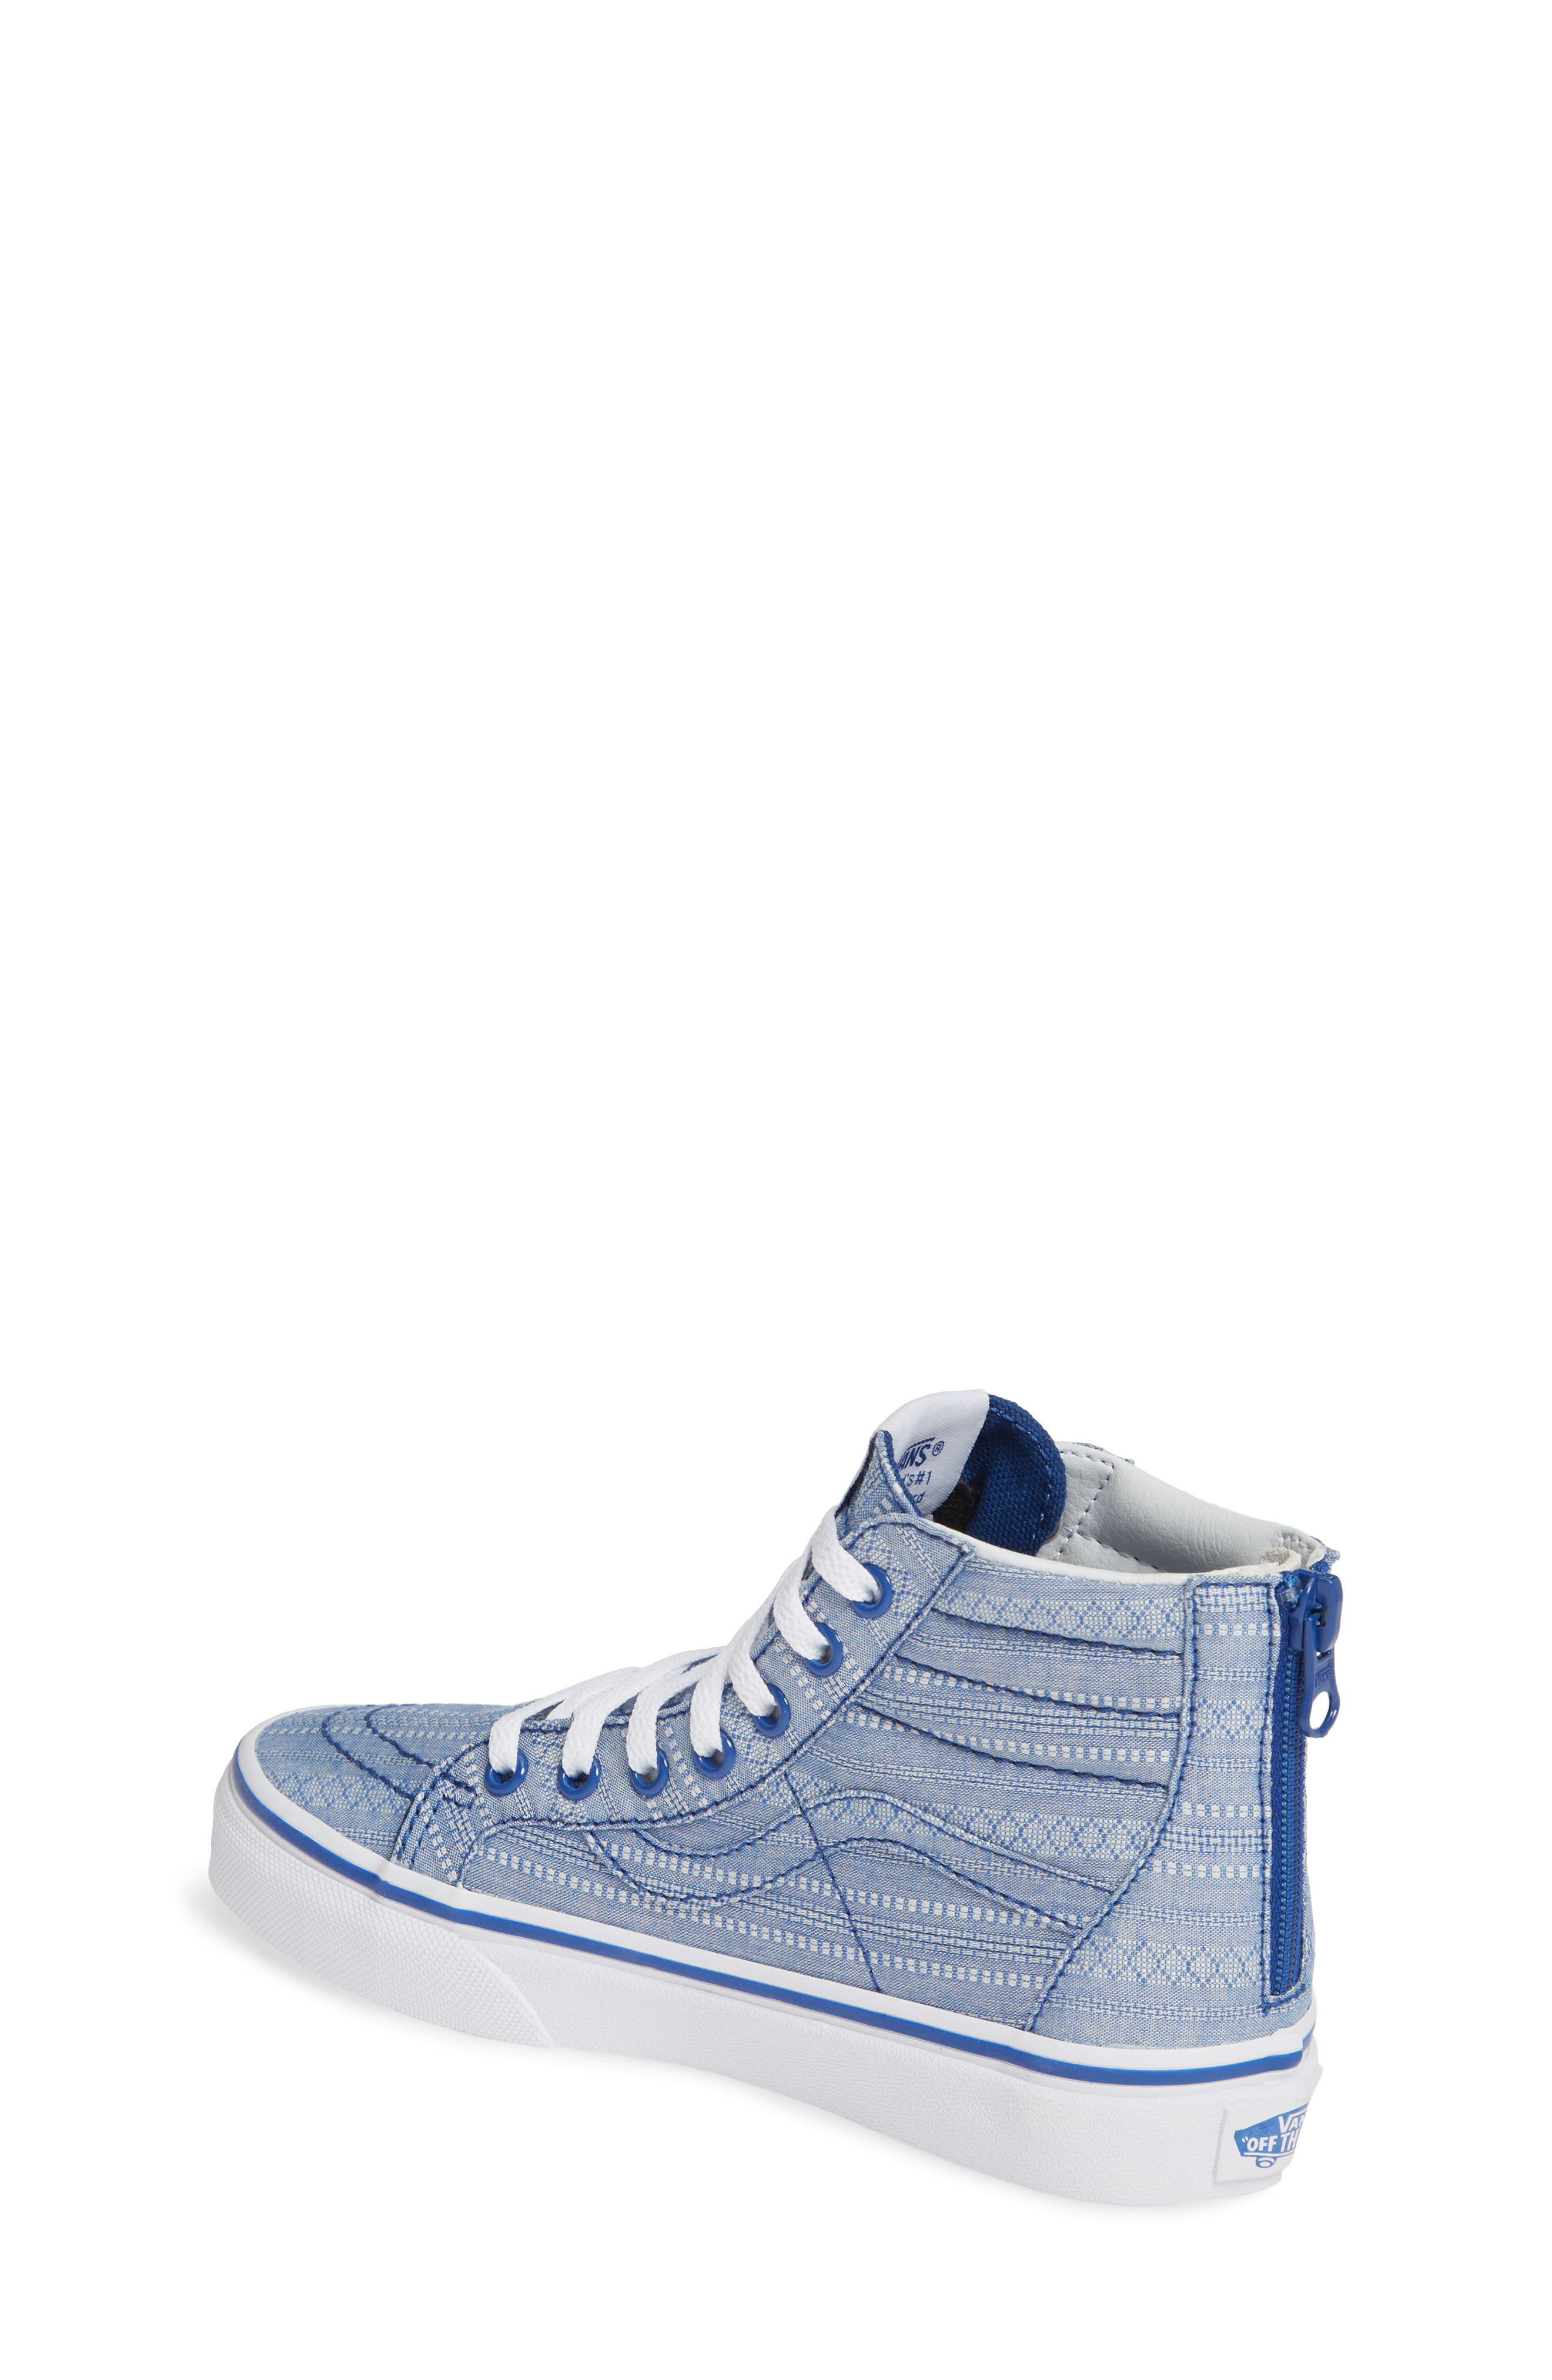 VANS, Sk8-Hi Zip Sneaker, Alternate thumbnail 2, color, TRUE BLUE/ TRUE WHITE